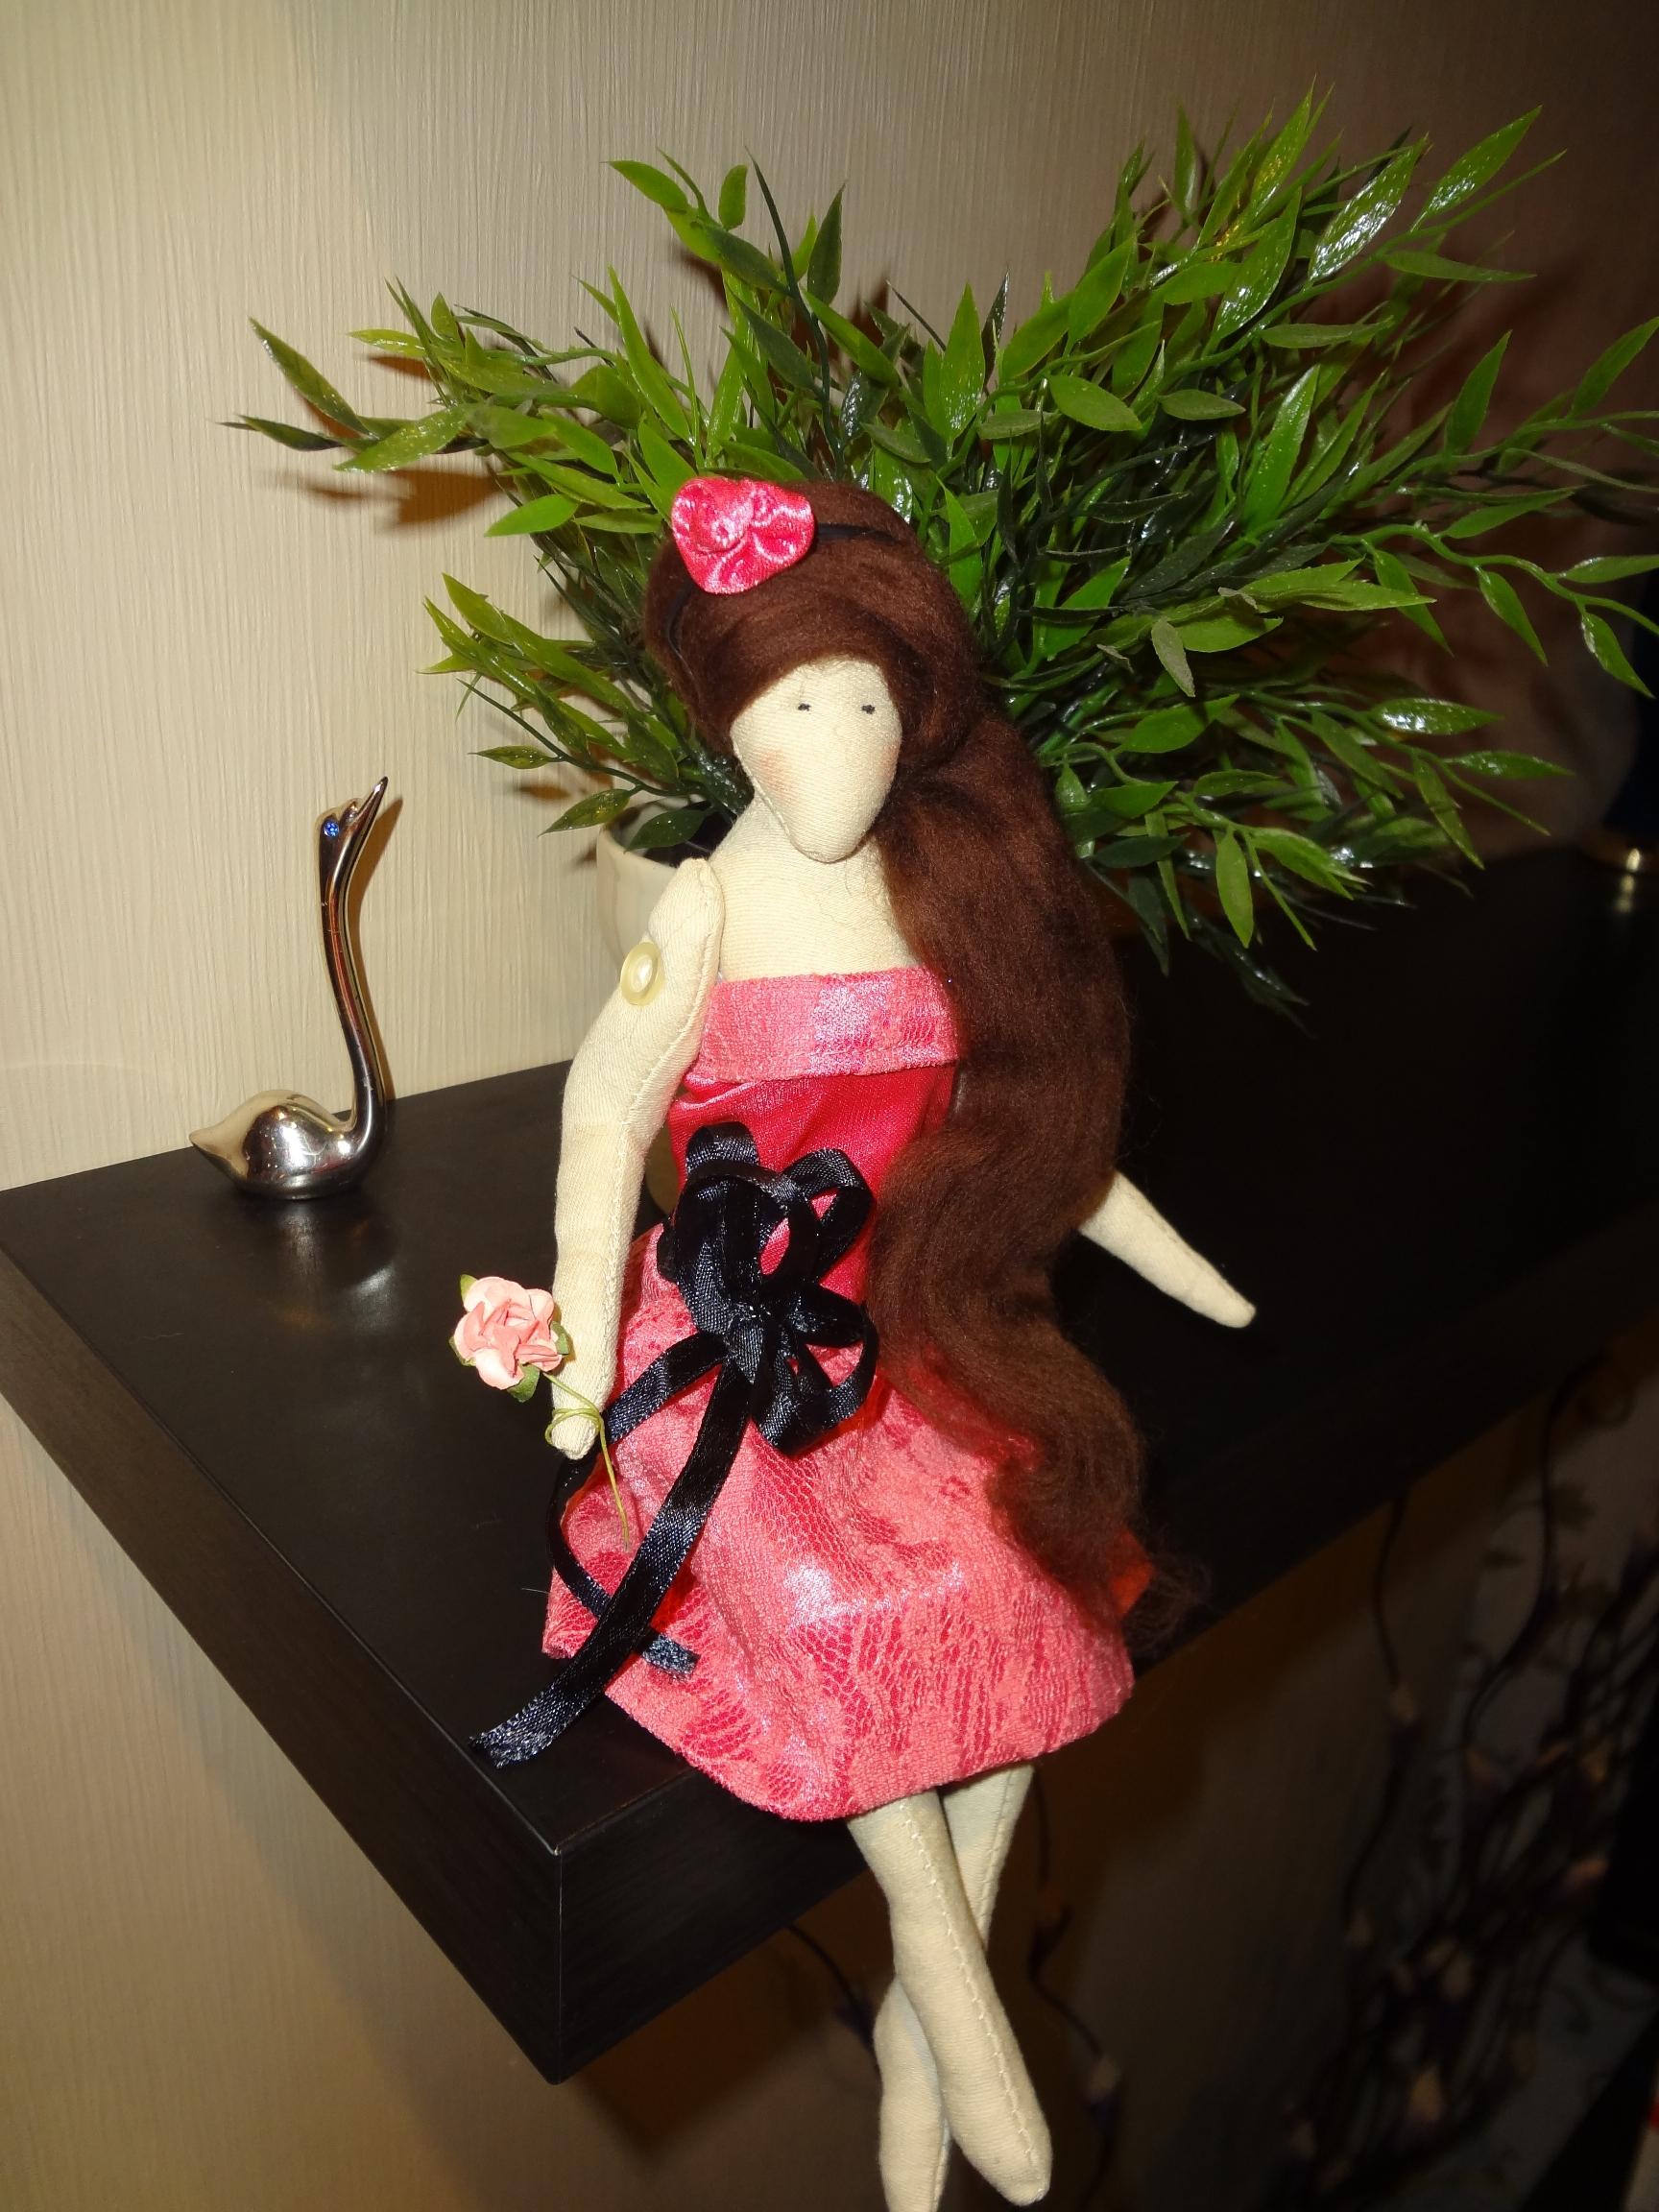 Сидячая кукла